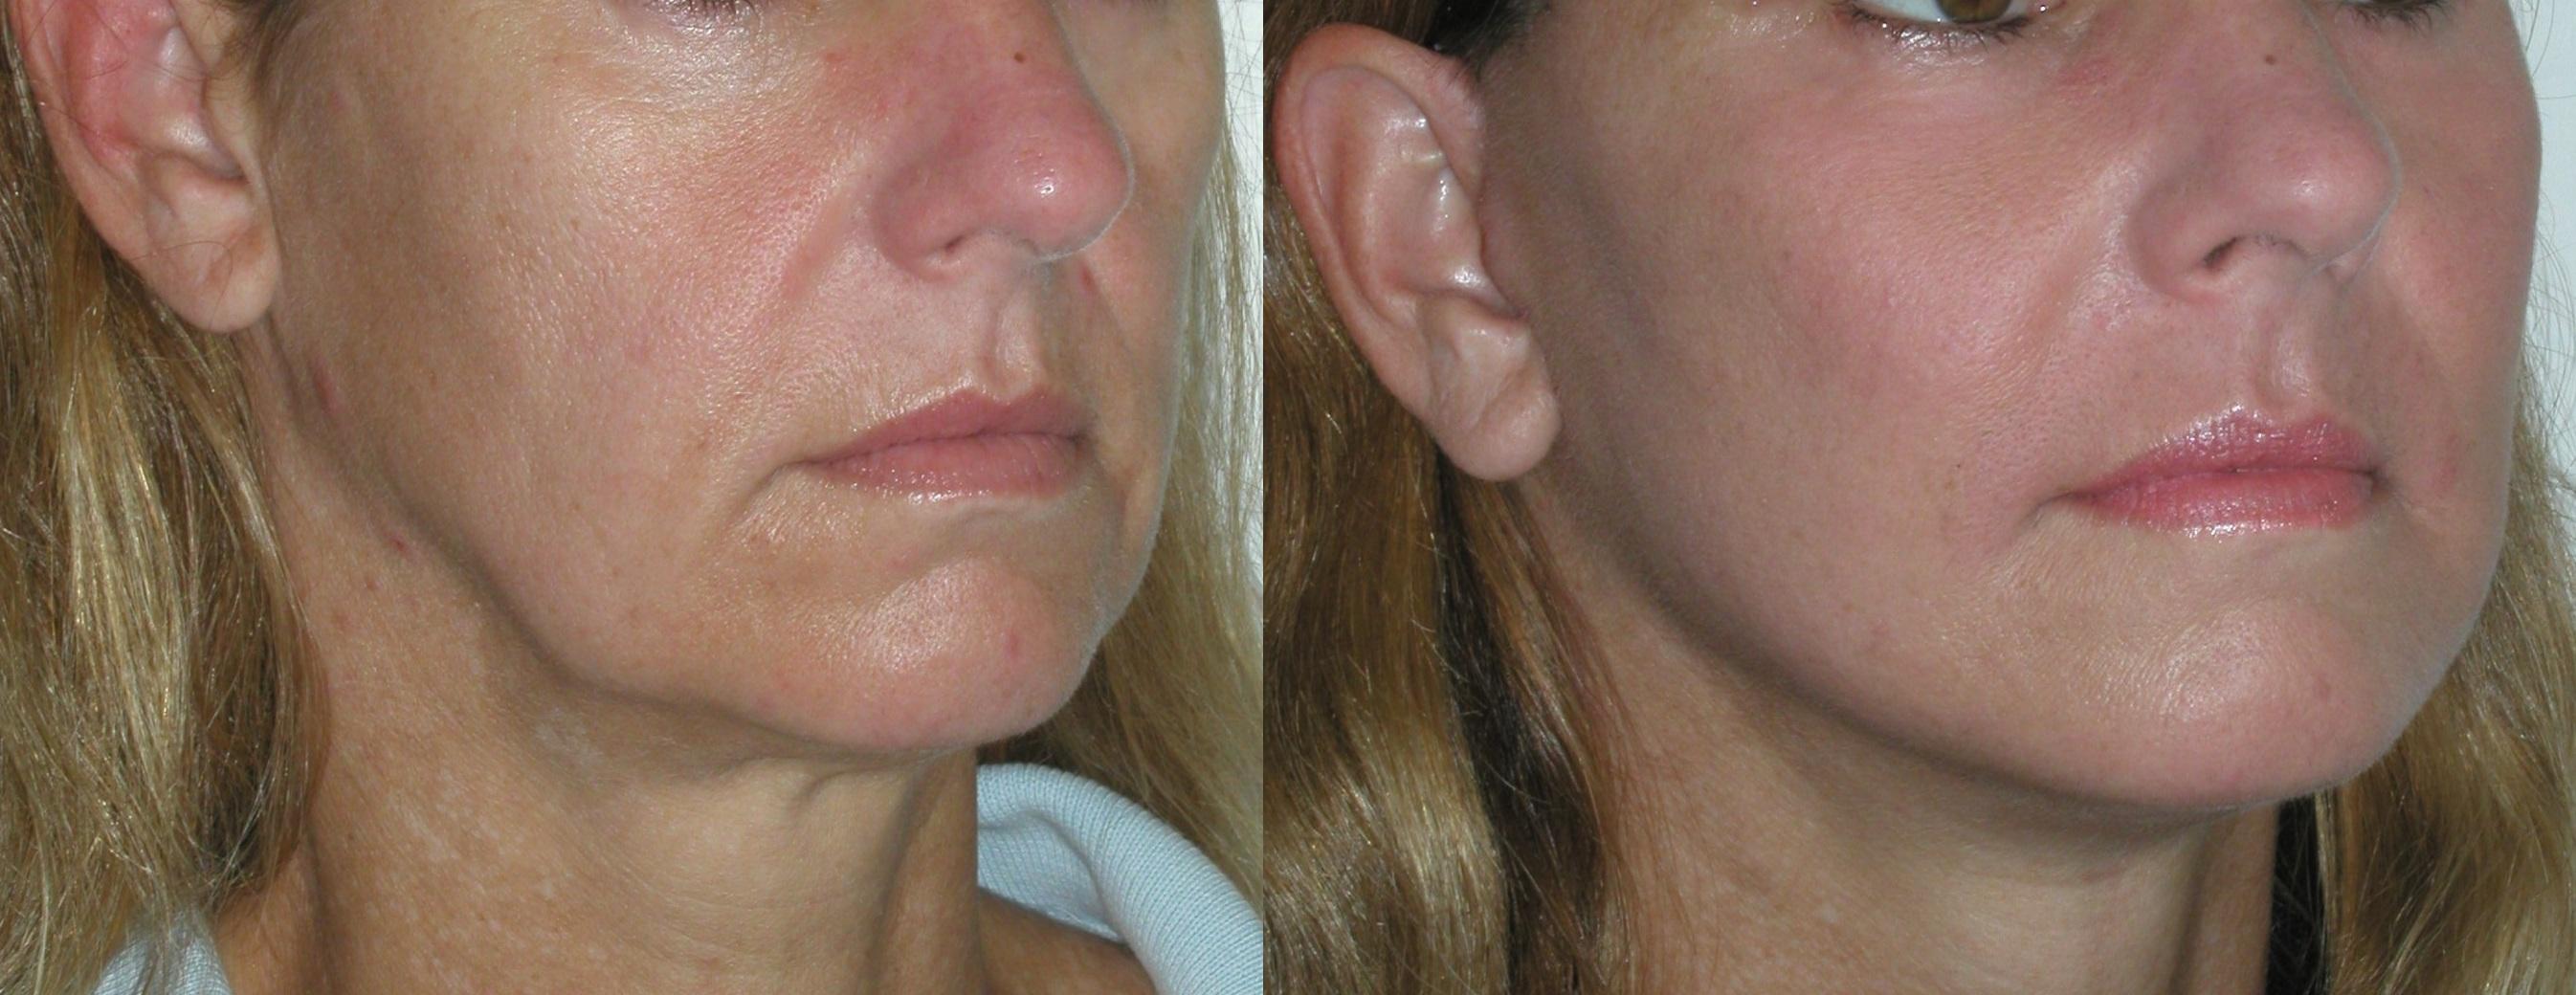 sagging-jowls-2  castelknock cosmetic clinic Dublin